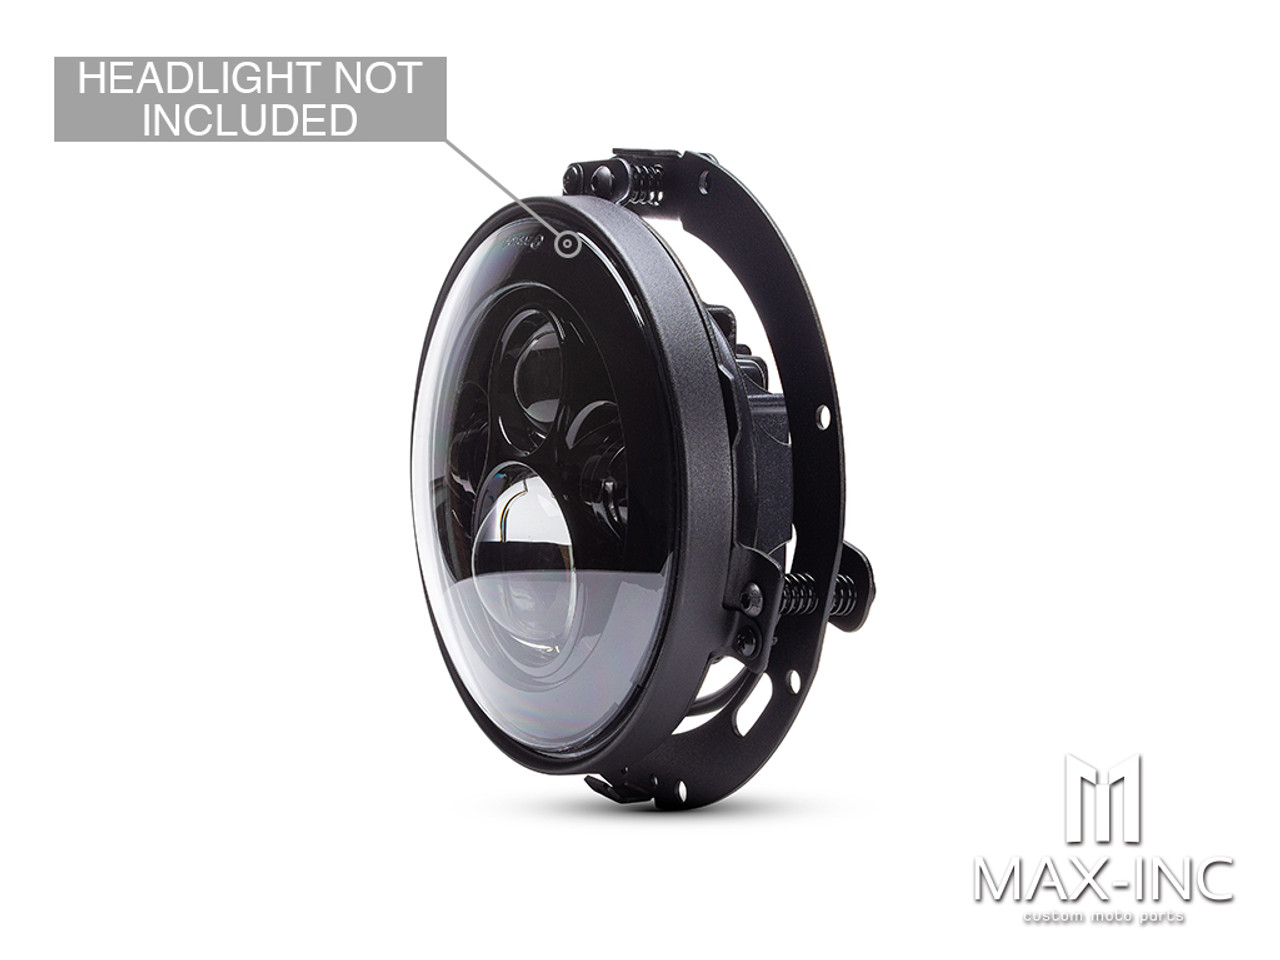 Black 7-Inch LED DayMaker Headlight Mounting Ring & Bracket for Harley Davidsons